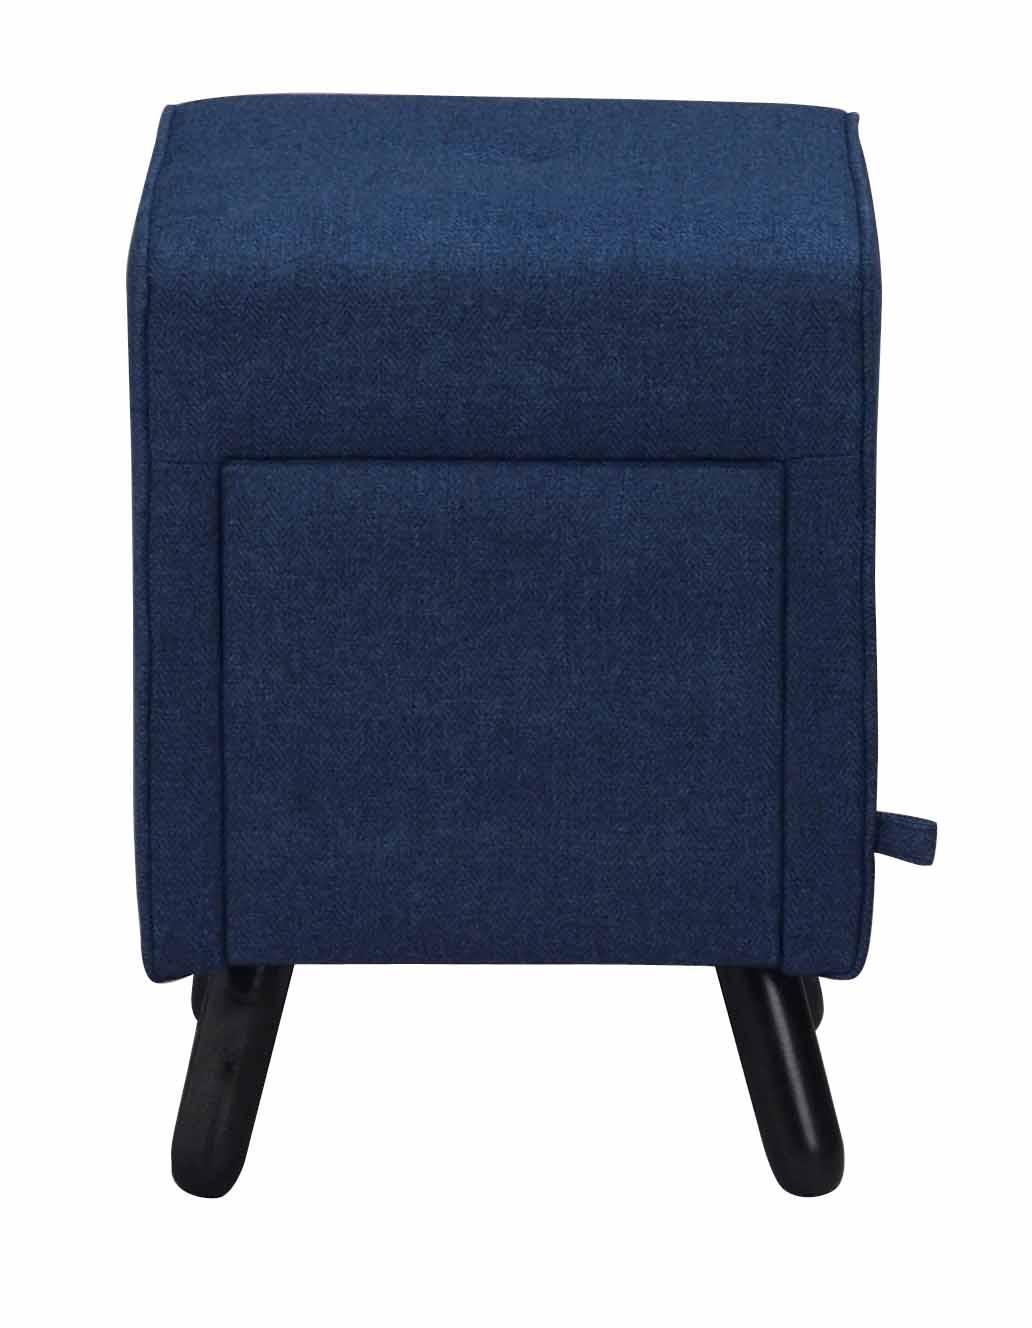 Image of   Mint puf - blåt stof og sorte ben, m. 1 skuffe